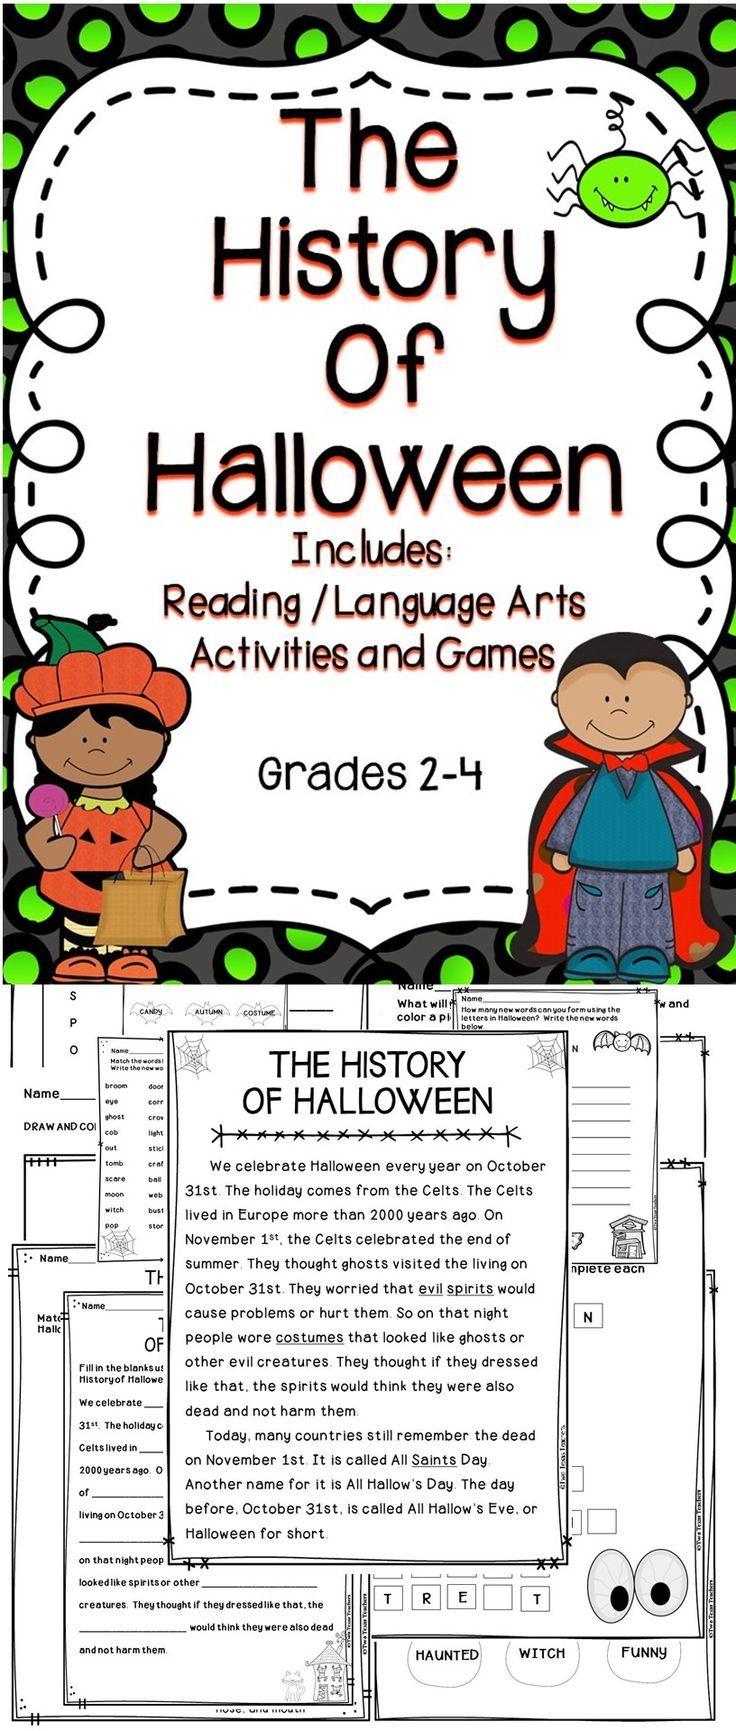 Halloween Happy Halloween! Teach children the history of  Halloween using this fun filled Halloween supplemental resource.  #halloween